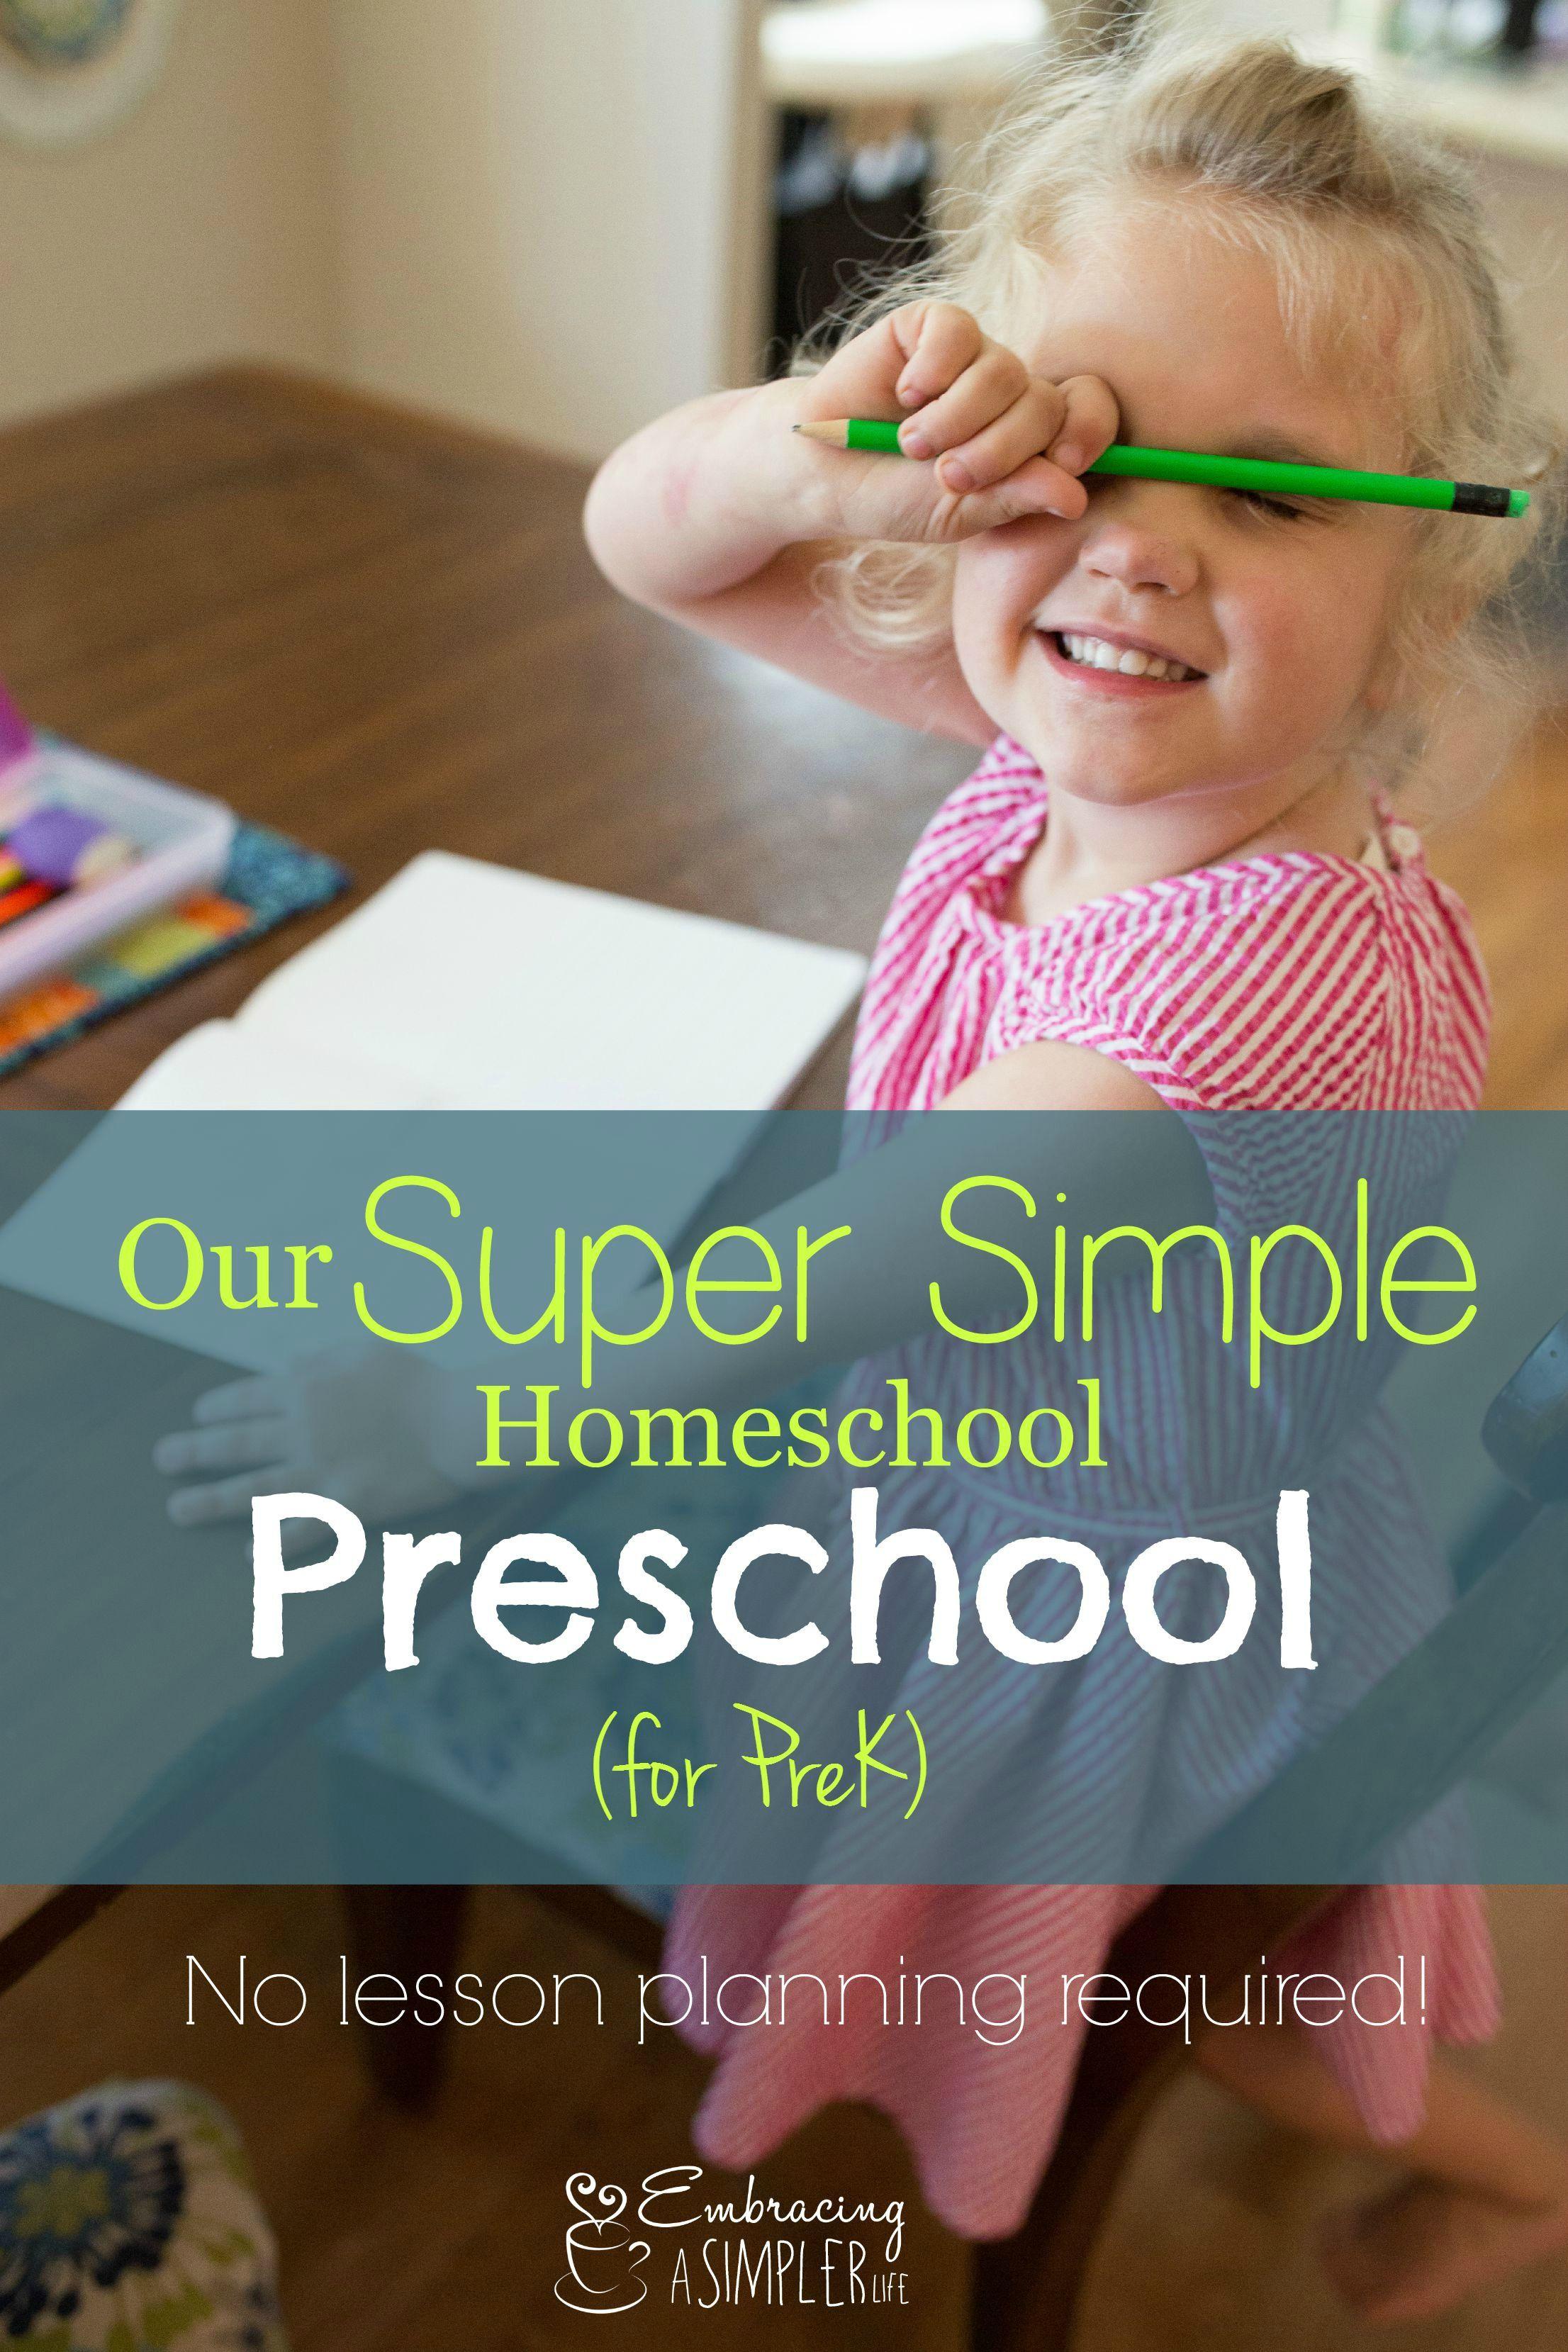 A Super Simple Homeschool Preschool Lesson Planning